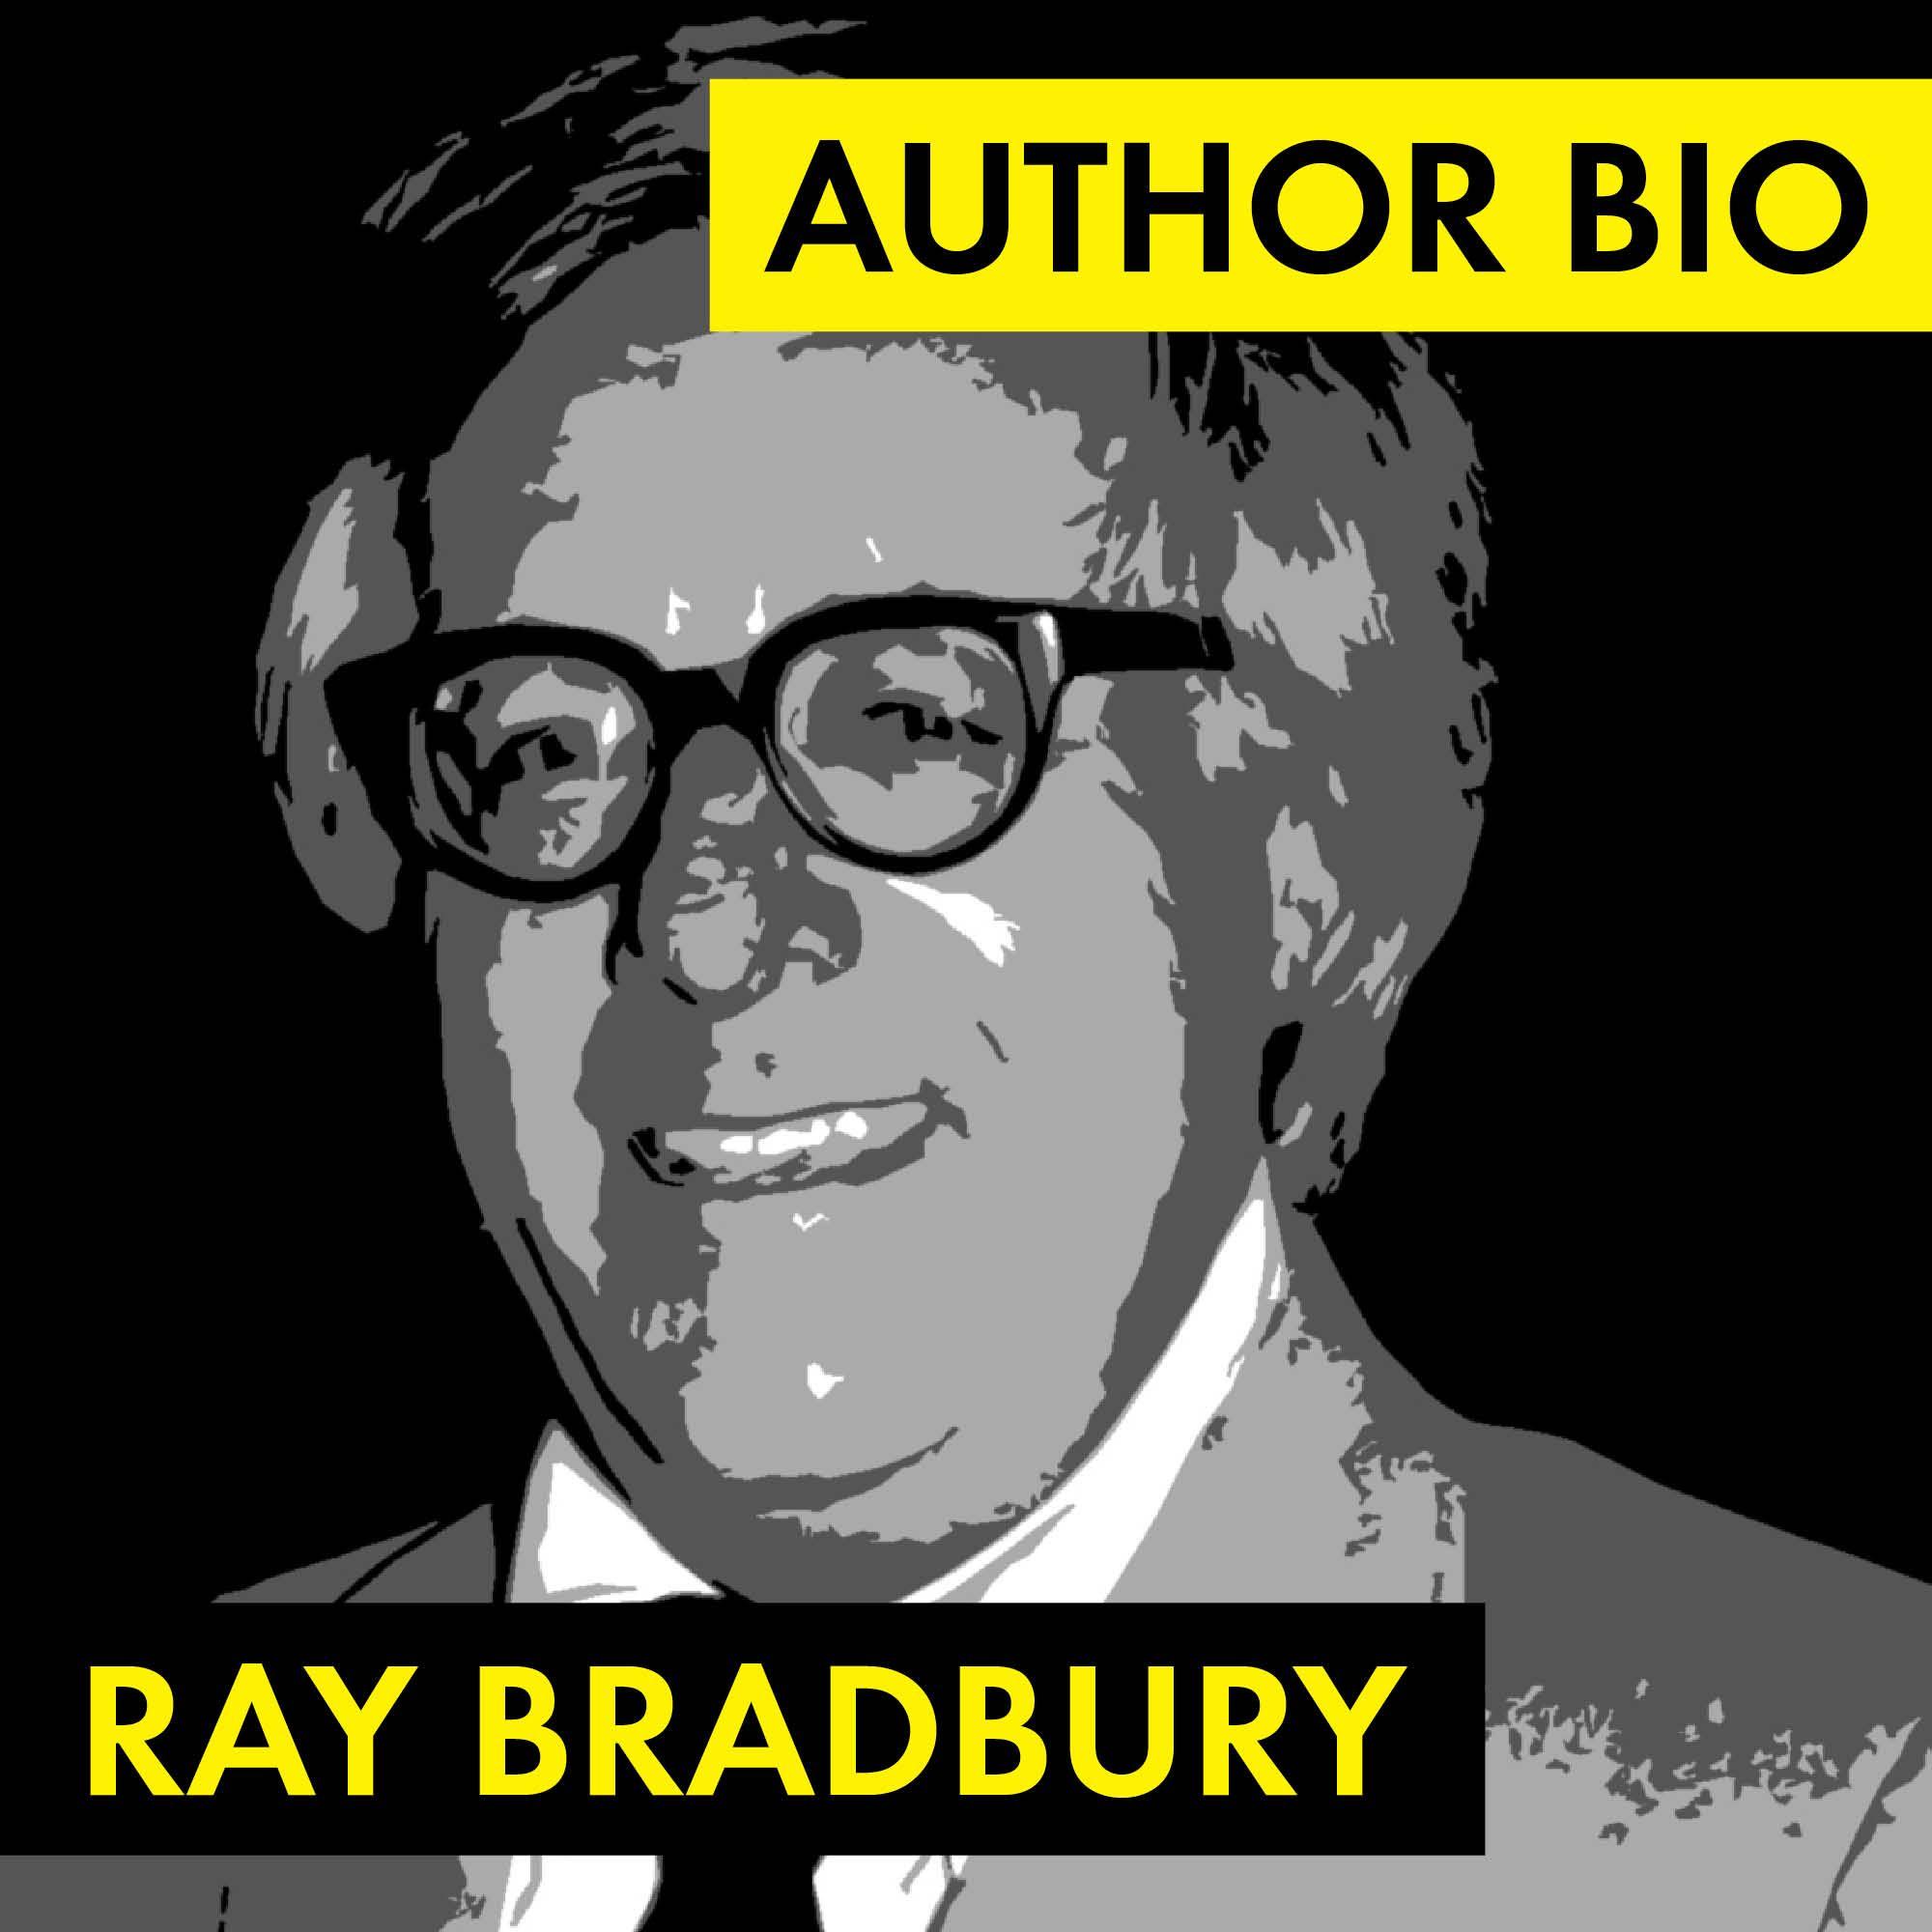 Ray Bradbury Biography Activity Highschool Middleschool